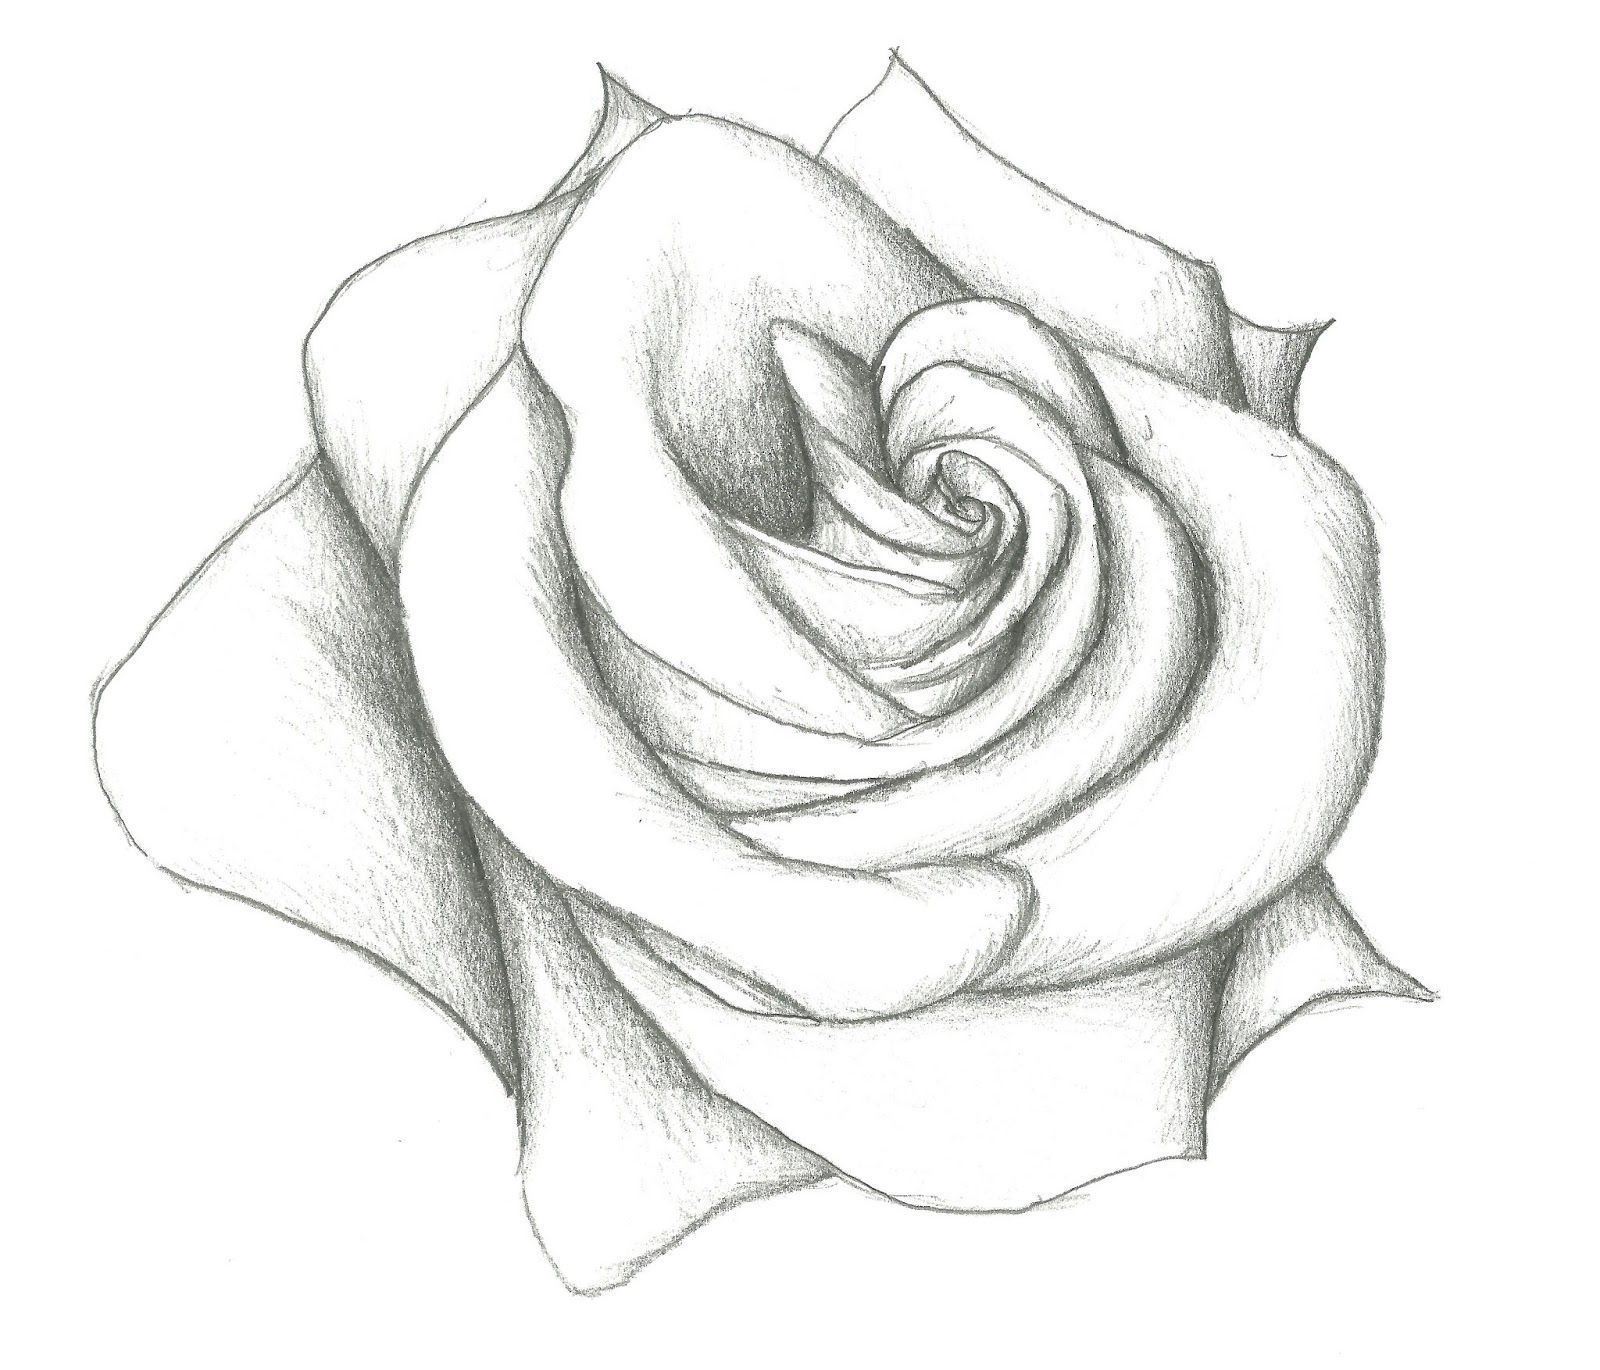 8 Exquisite Draw A 3d Glass Ideas Pencil Sketches Easy Flower Sketches Pencil Drawings Easy